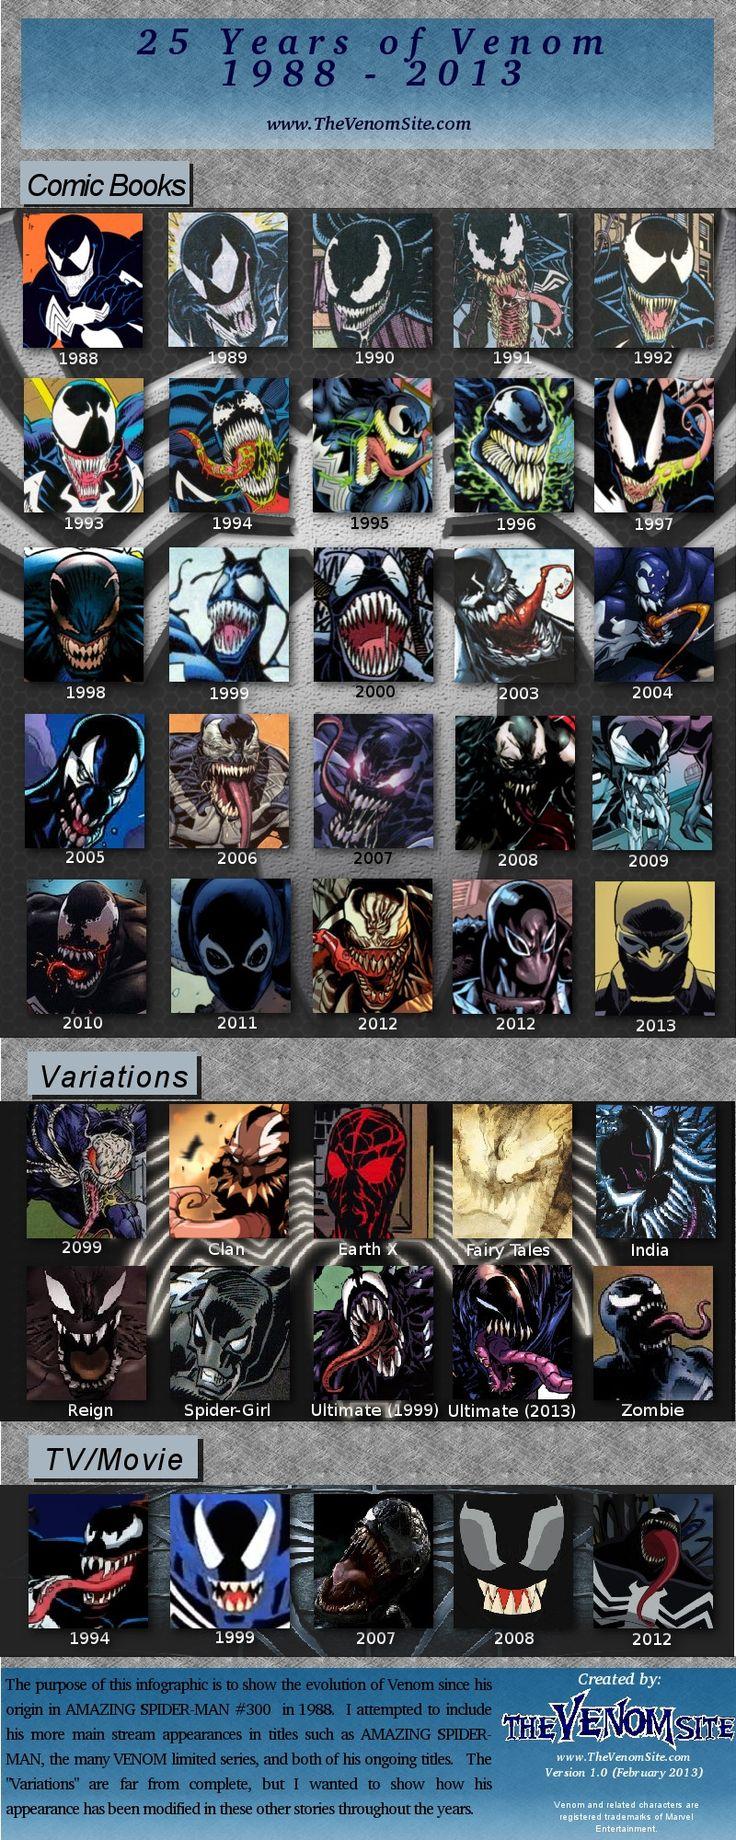 25 Years of Venom Infograpic